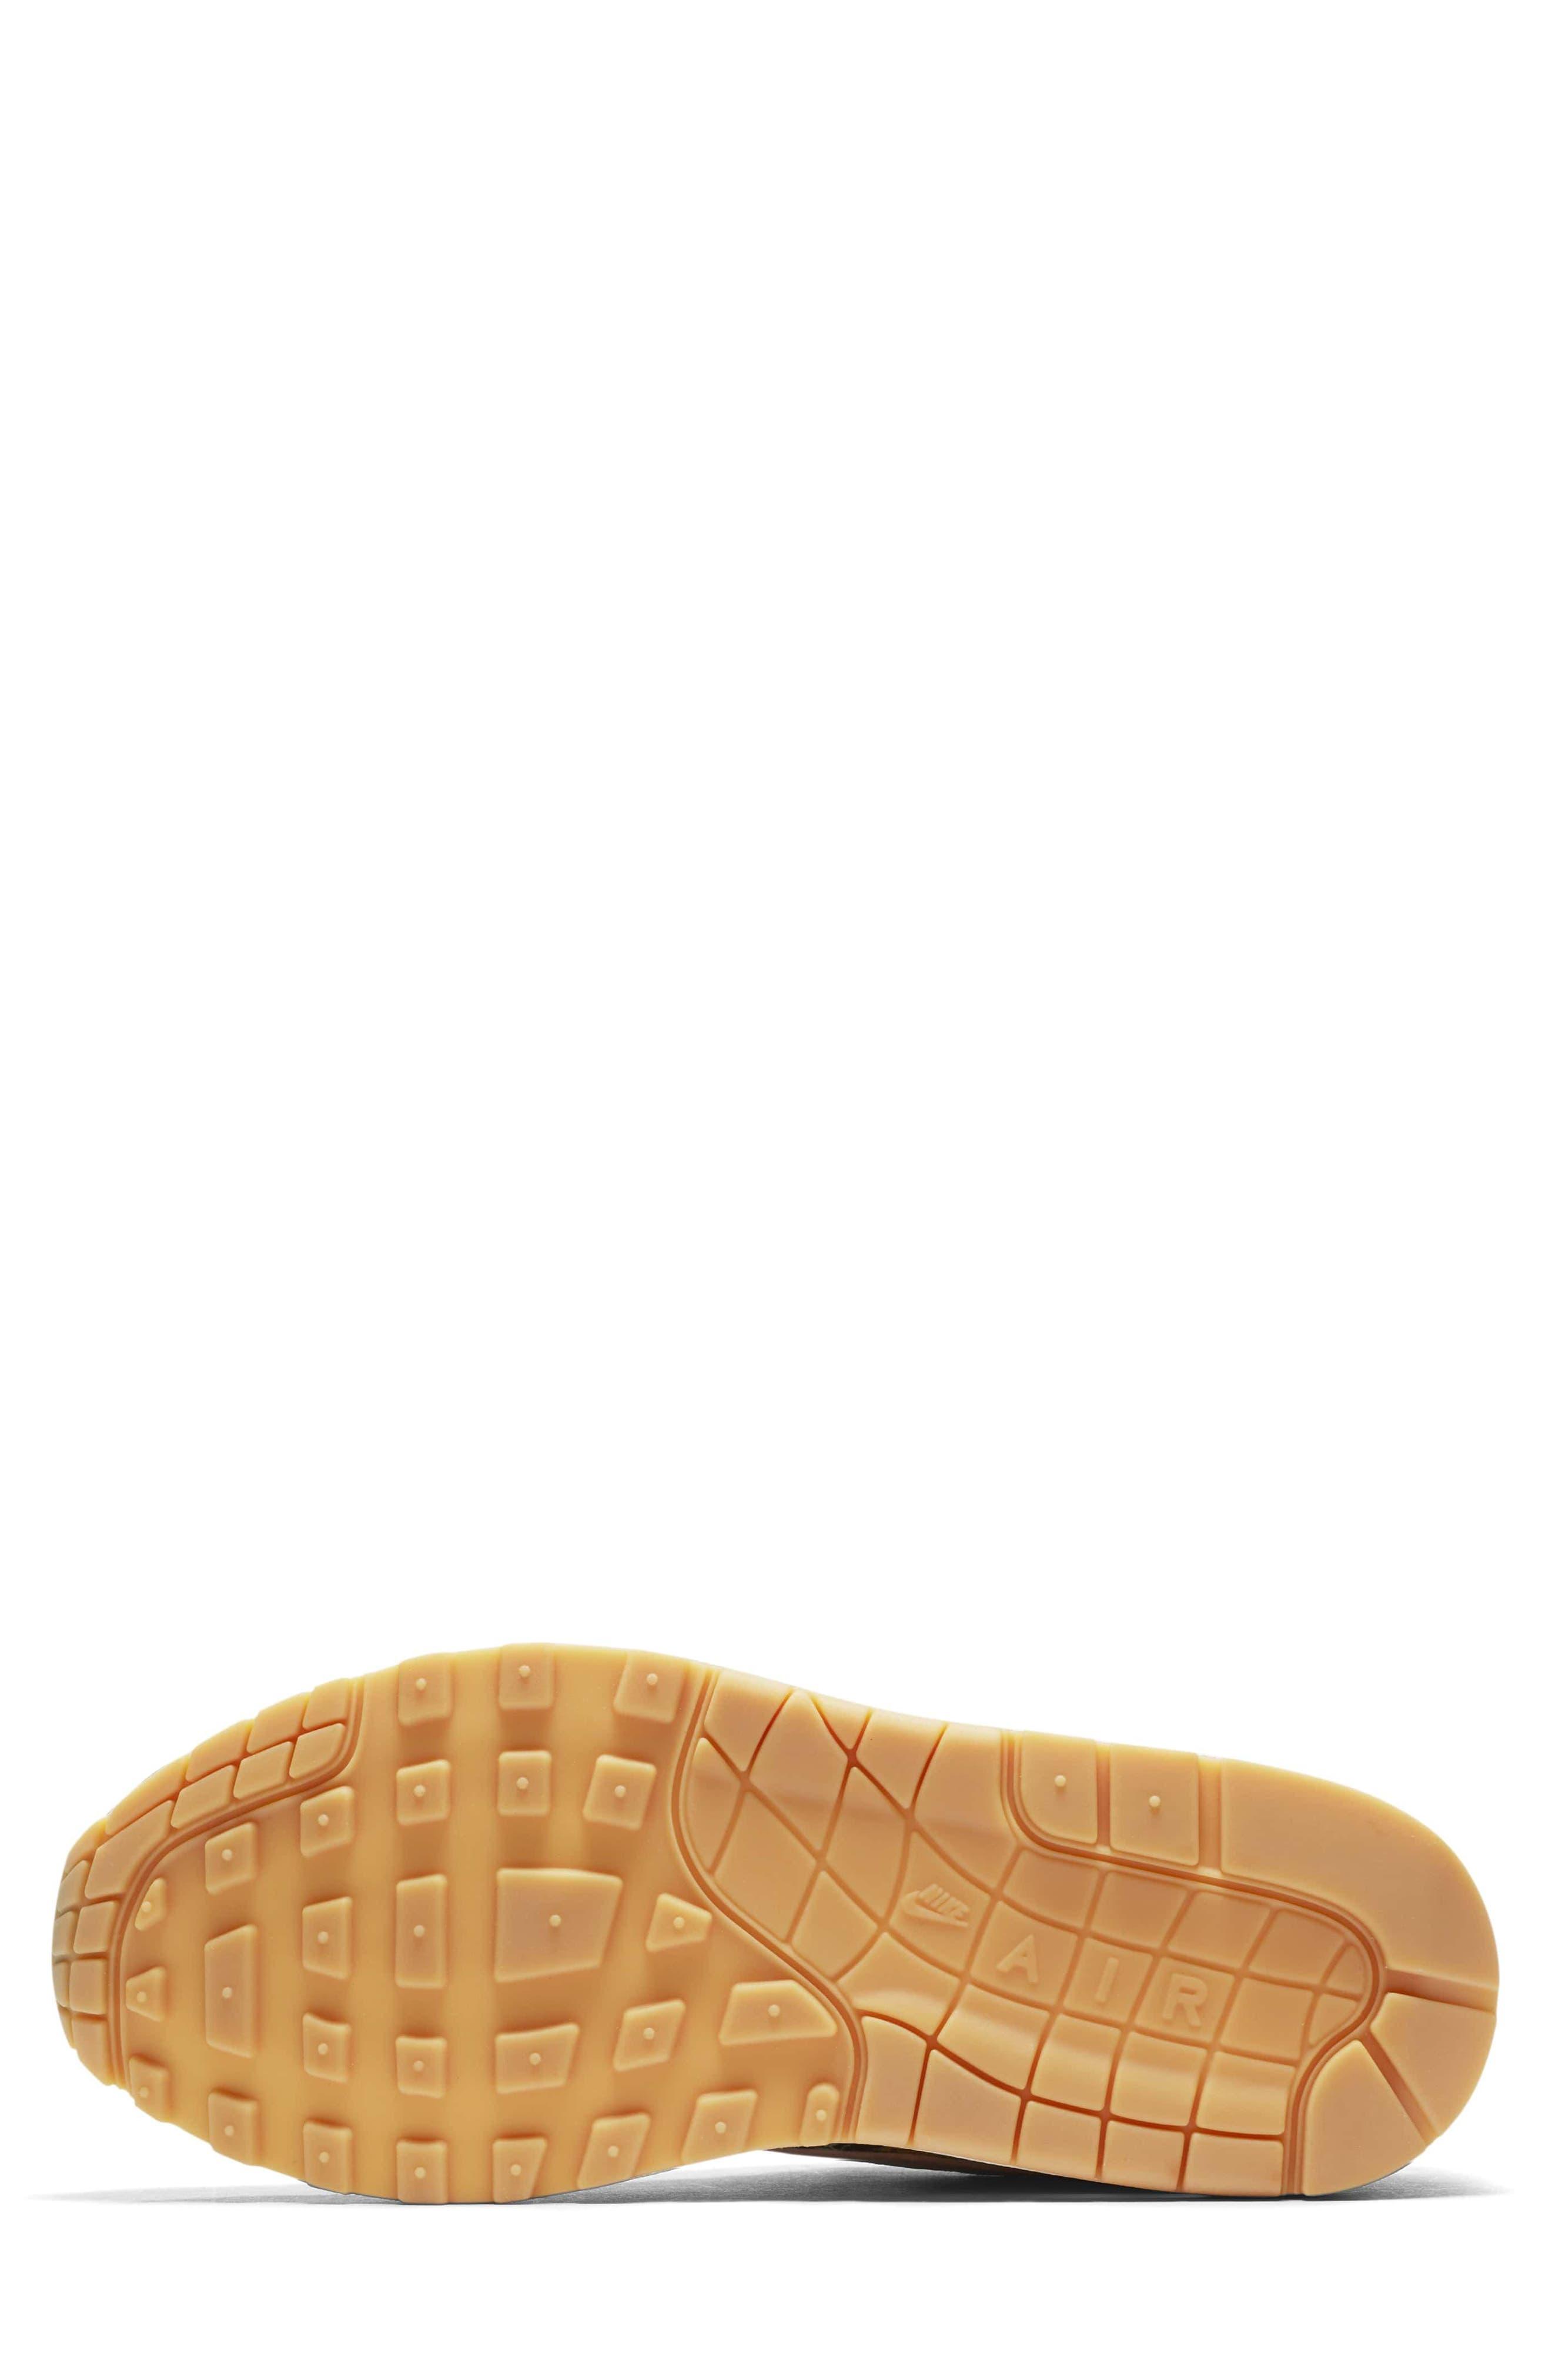 Air Max 1 QS Sneaker,                             Alternate thumbnail 5, color,                             003